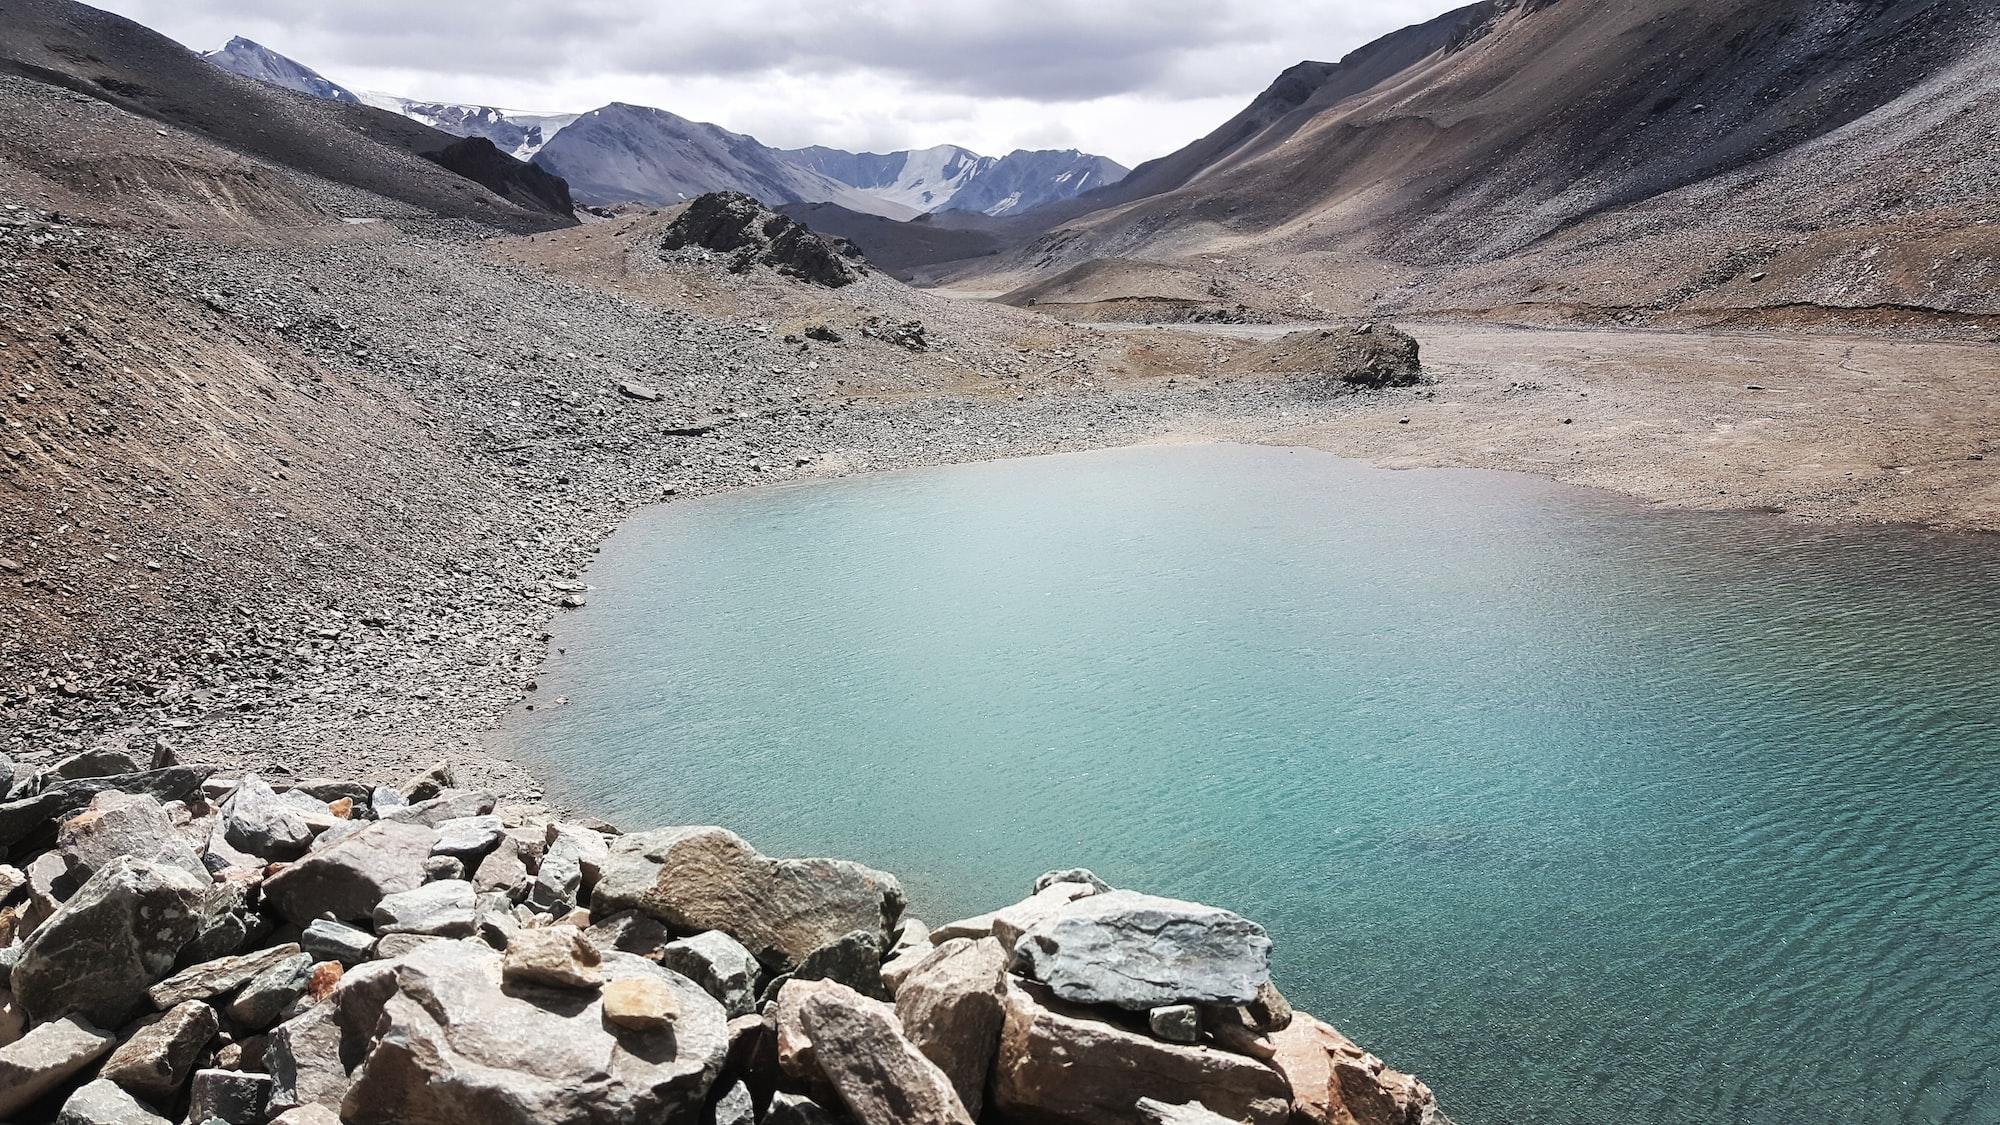 Beautiful lake and mountains in Indian Himalayas, Ladakh region 🇮🇳